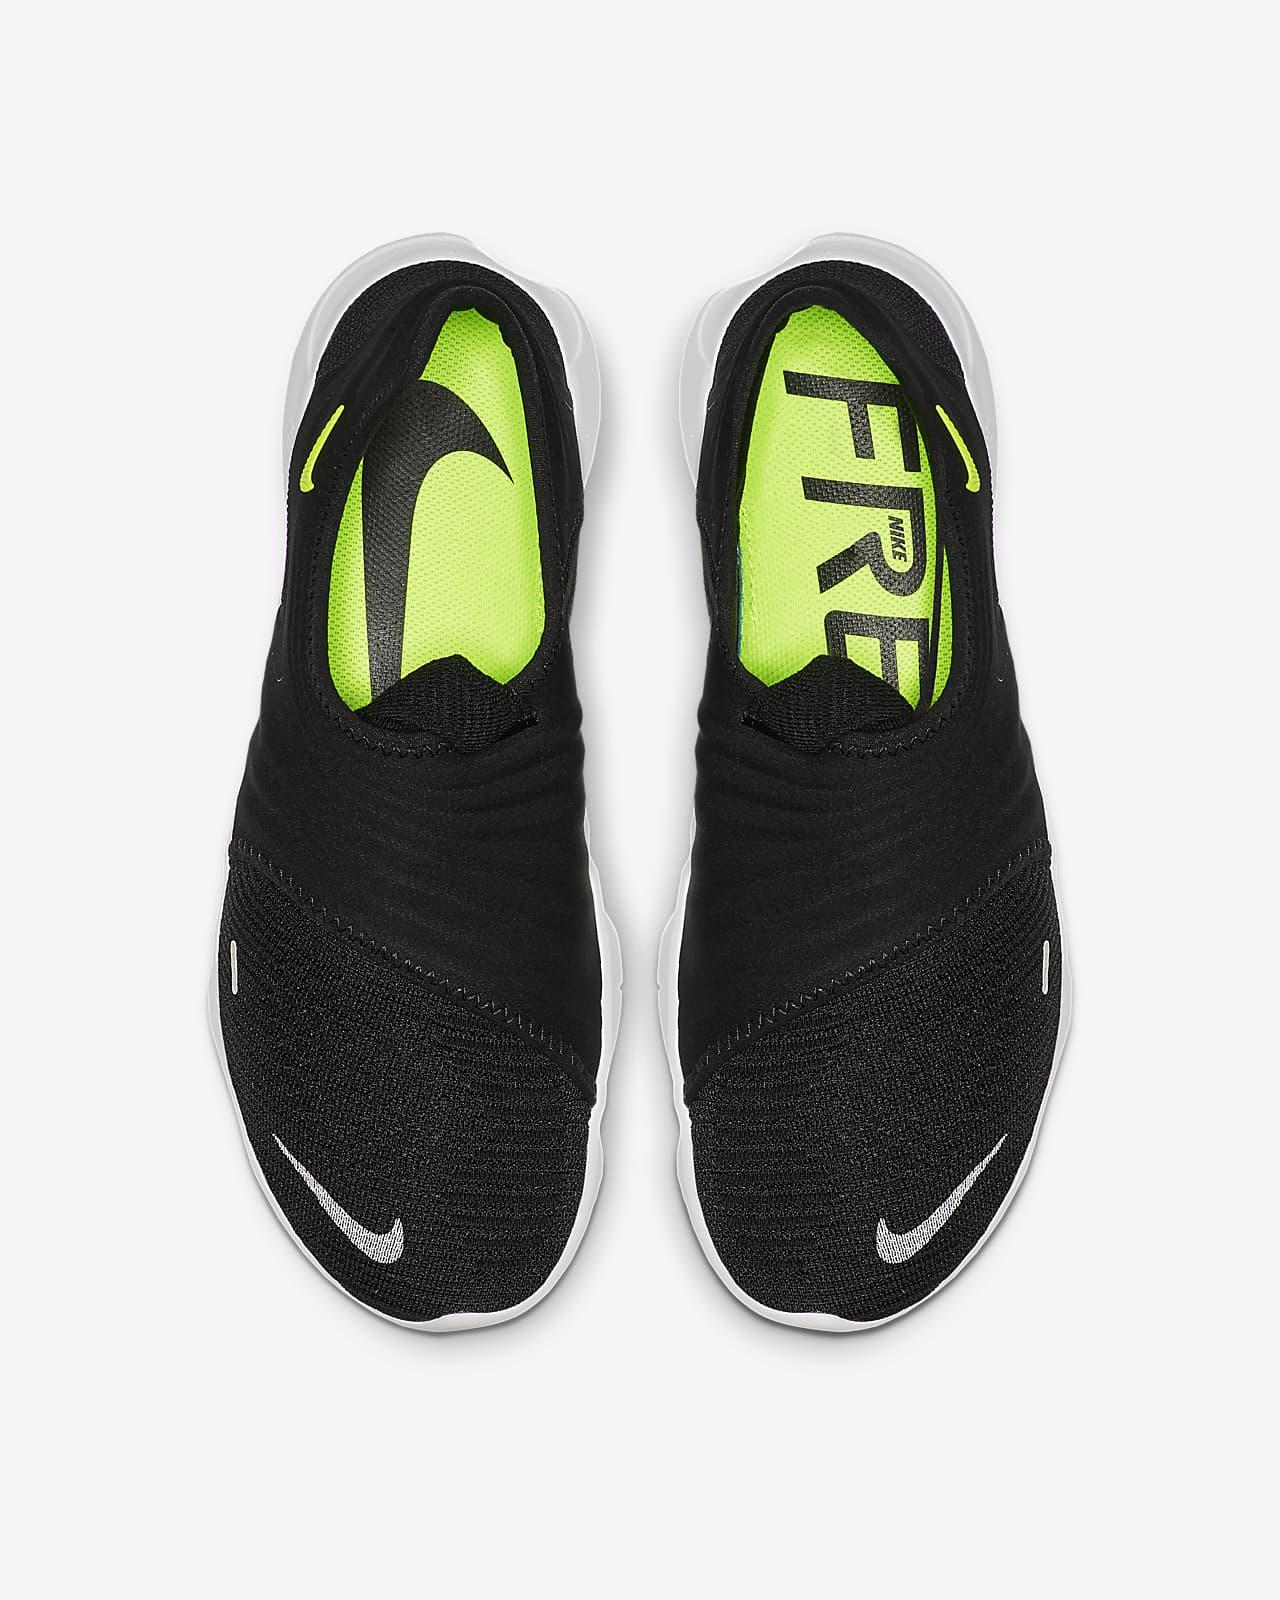 Nike Free RN Flyknit 3.0 Men's Running